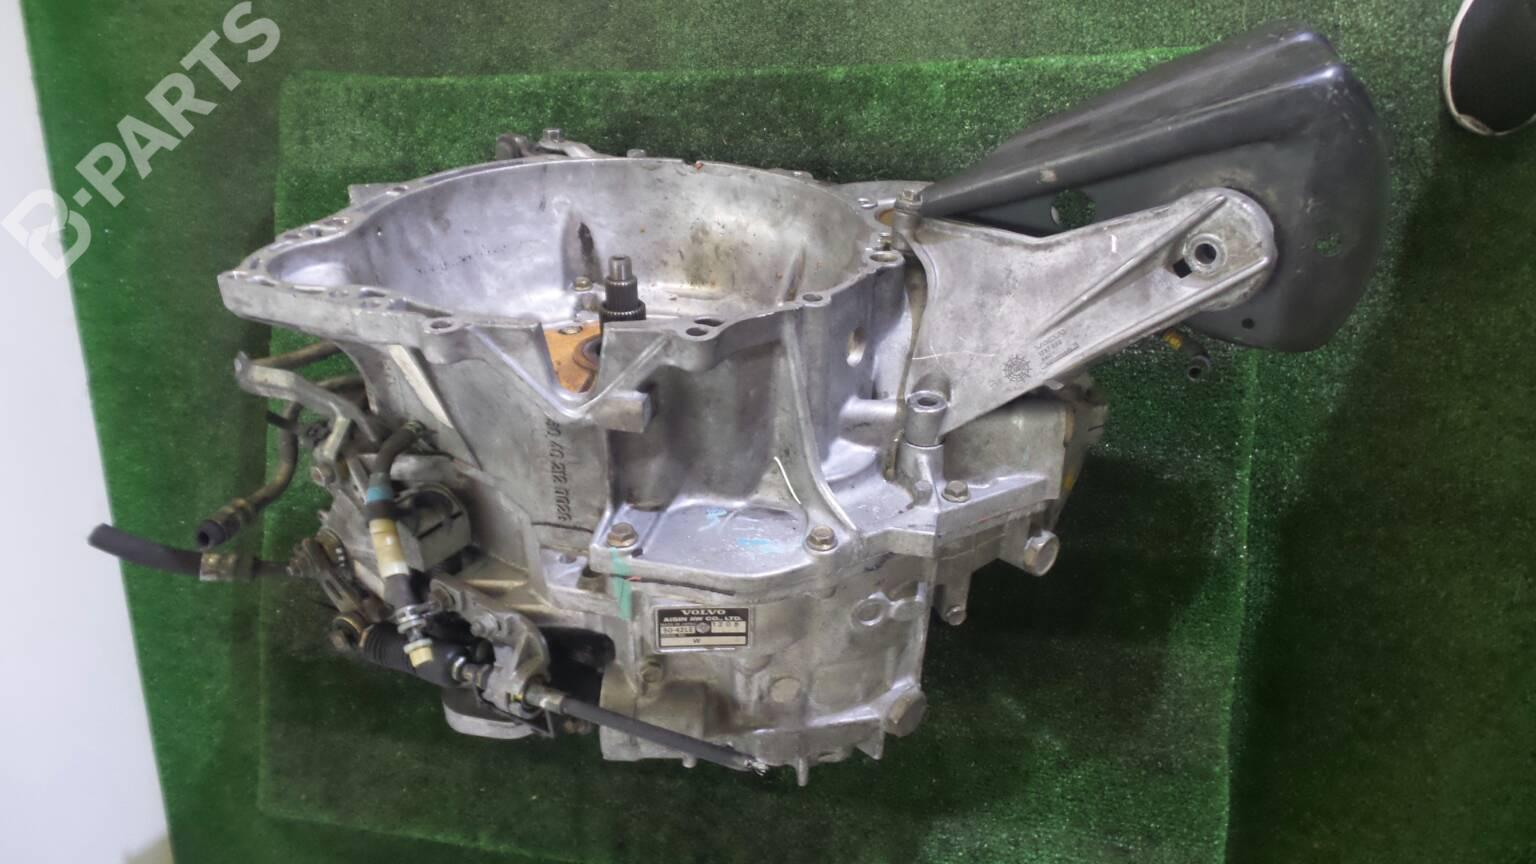 Automatic Gearbox Volvo 850 Ls 25 122980 1994 Engine Schematics 55 42le 1208573 254 Doors